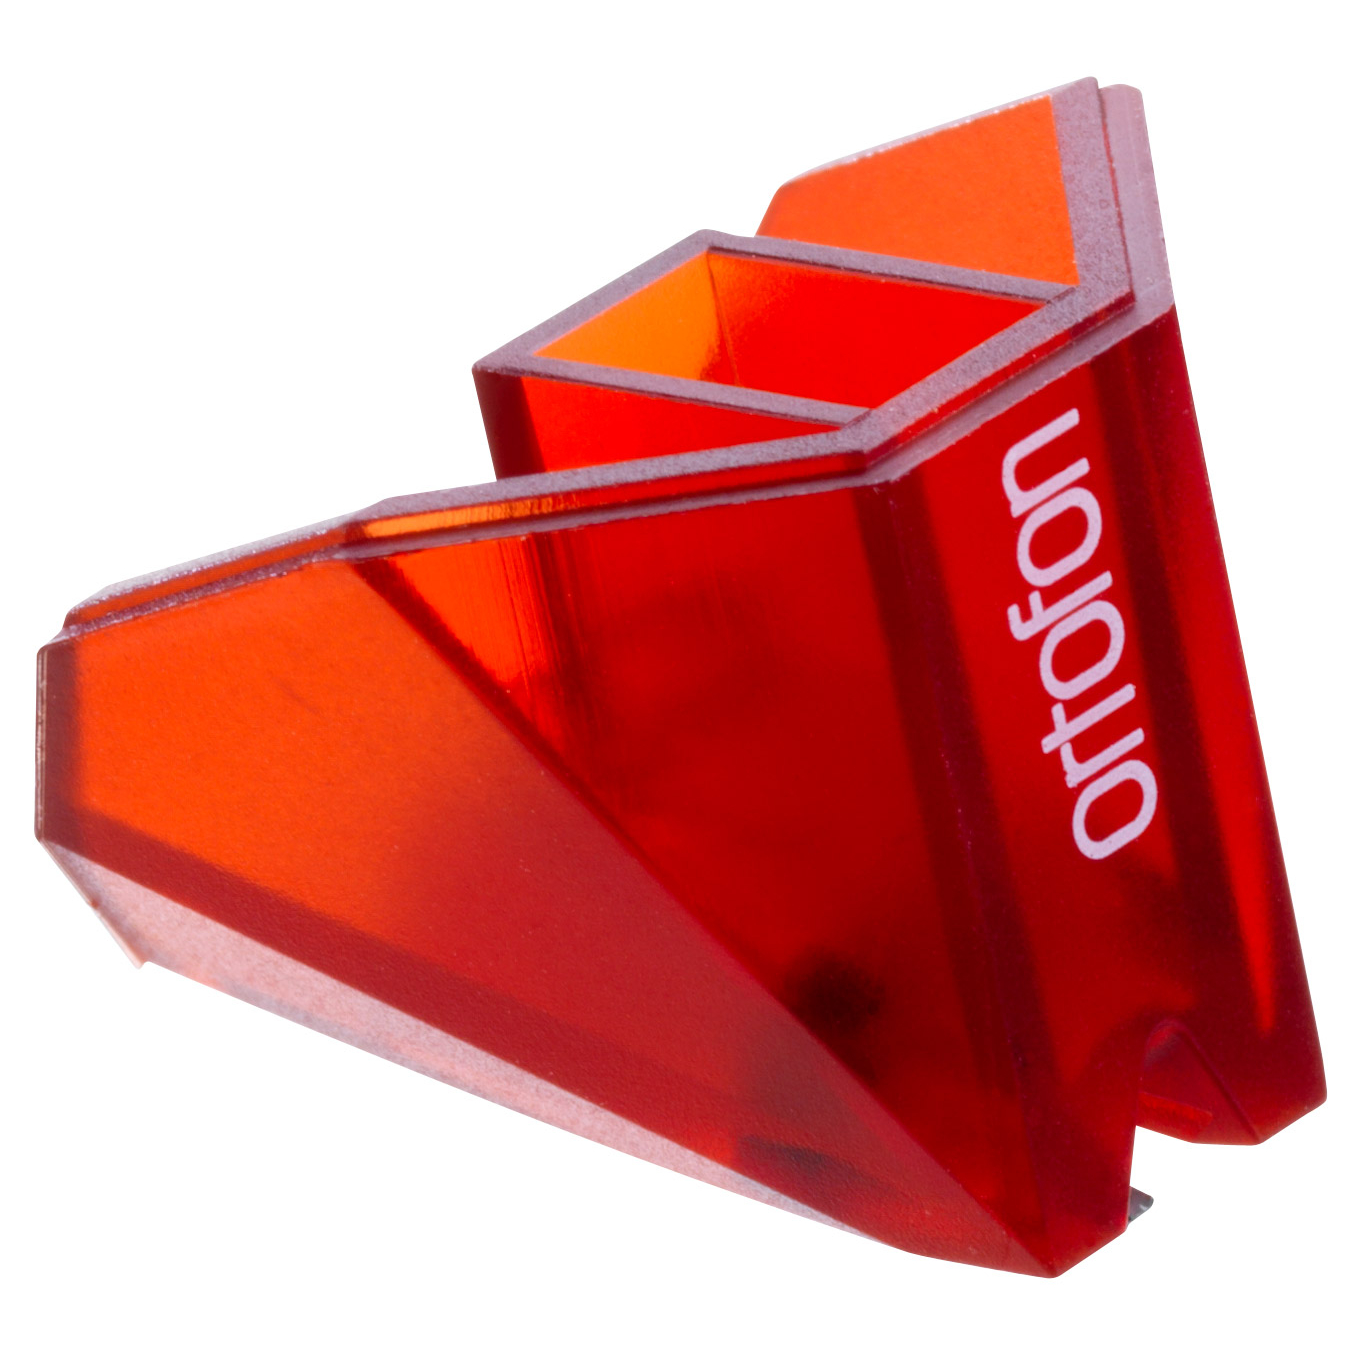 Ortofon 2M Red naald/ vervaningsnaald